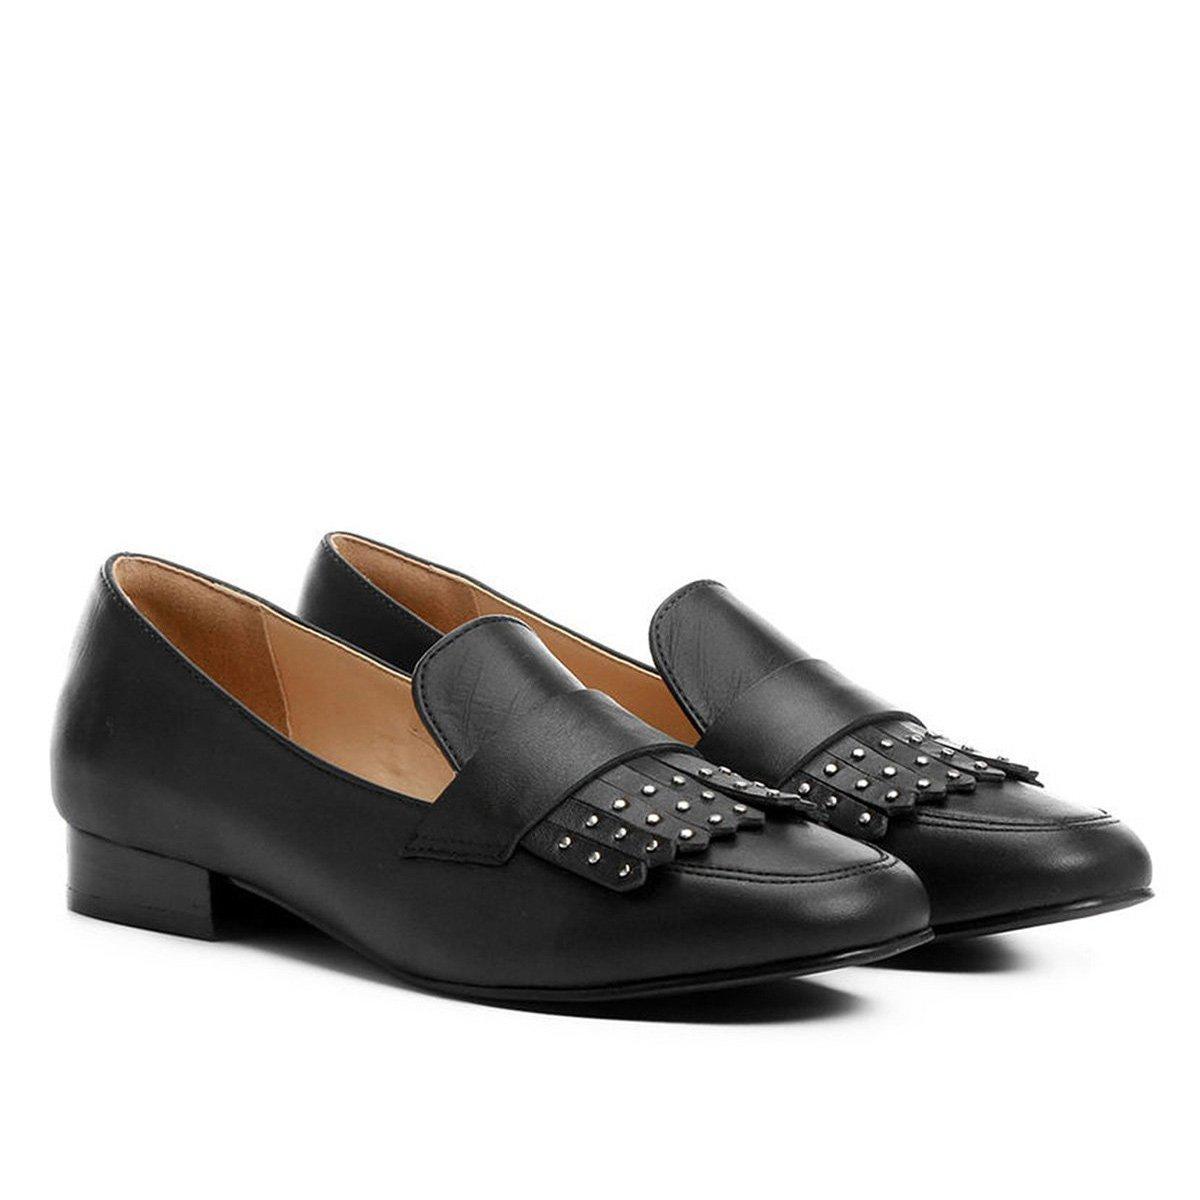 c29536aa1c Mocassim Couro Shoestock Franja Apliques Feminina - Preto